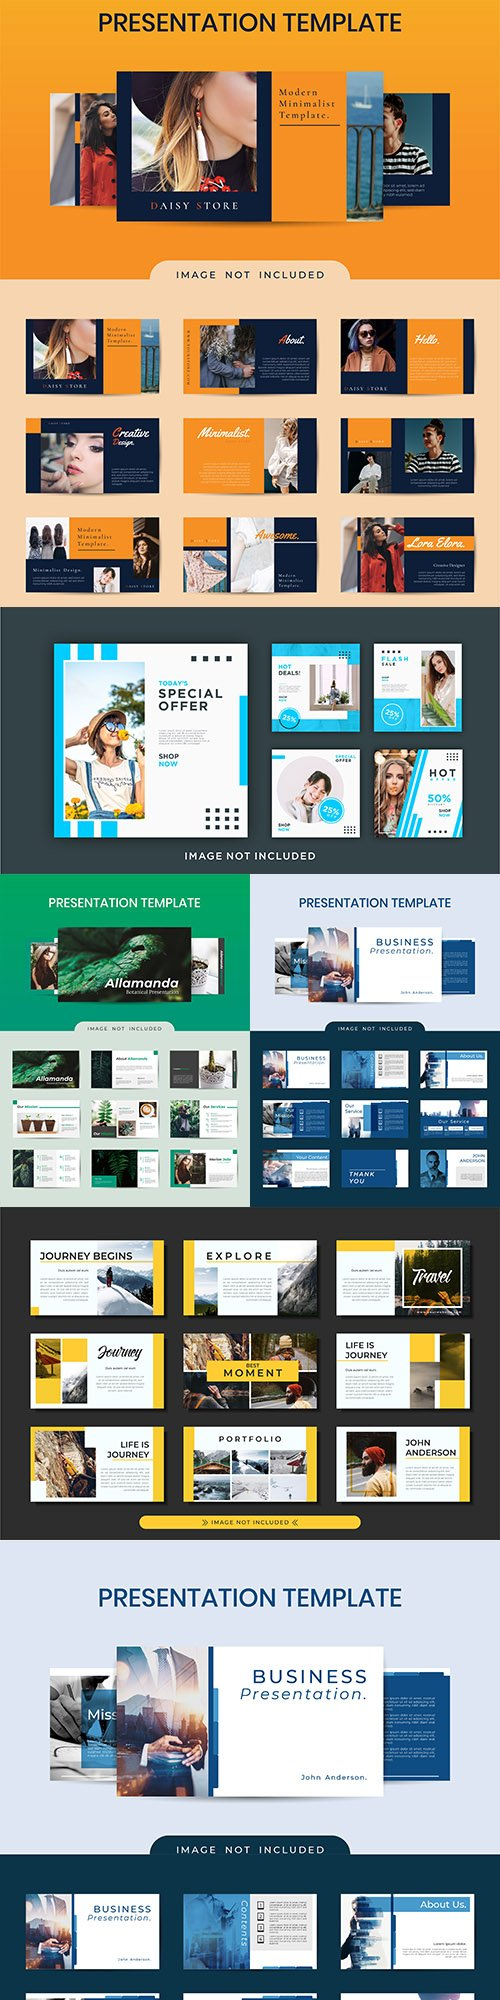 Business presentation template website design